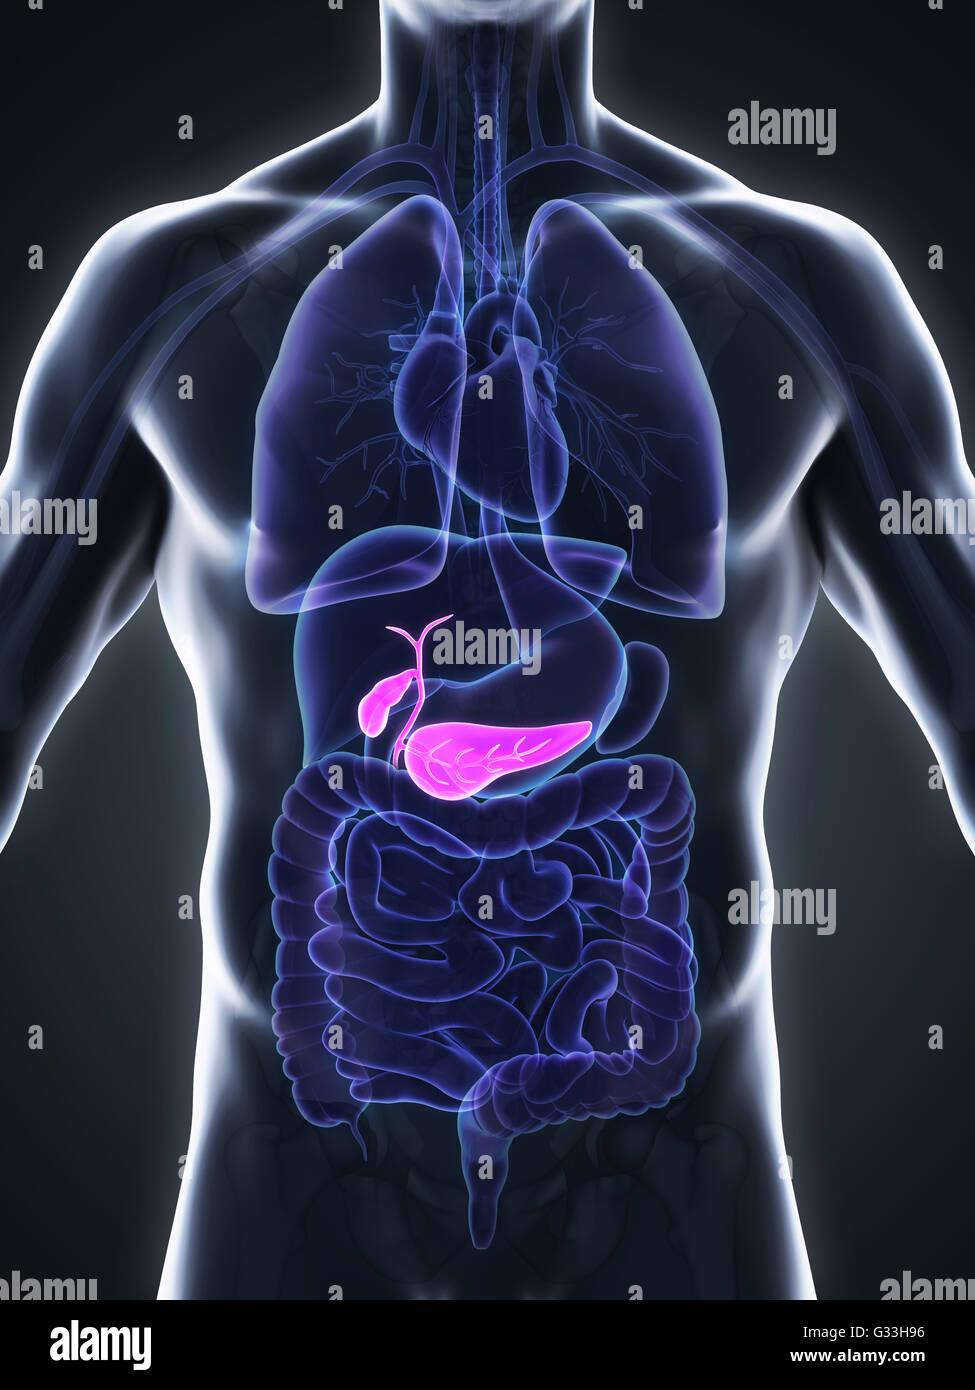 Human Gallbladder and Pancreas Anatomy Stock Photo: 105185618 - Alamy